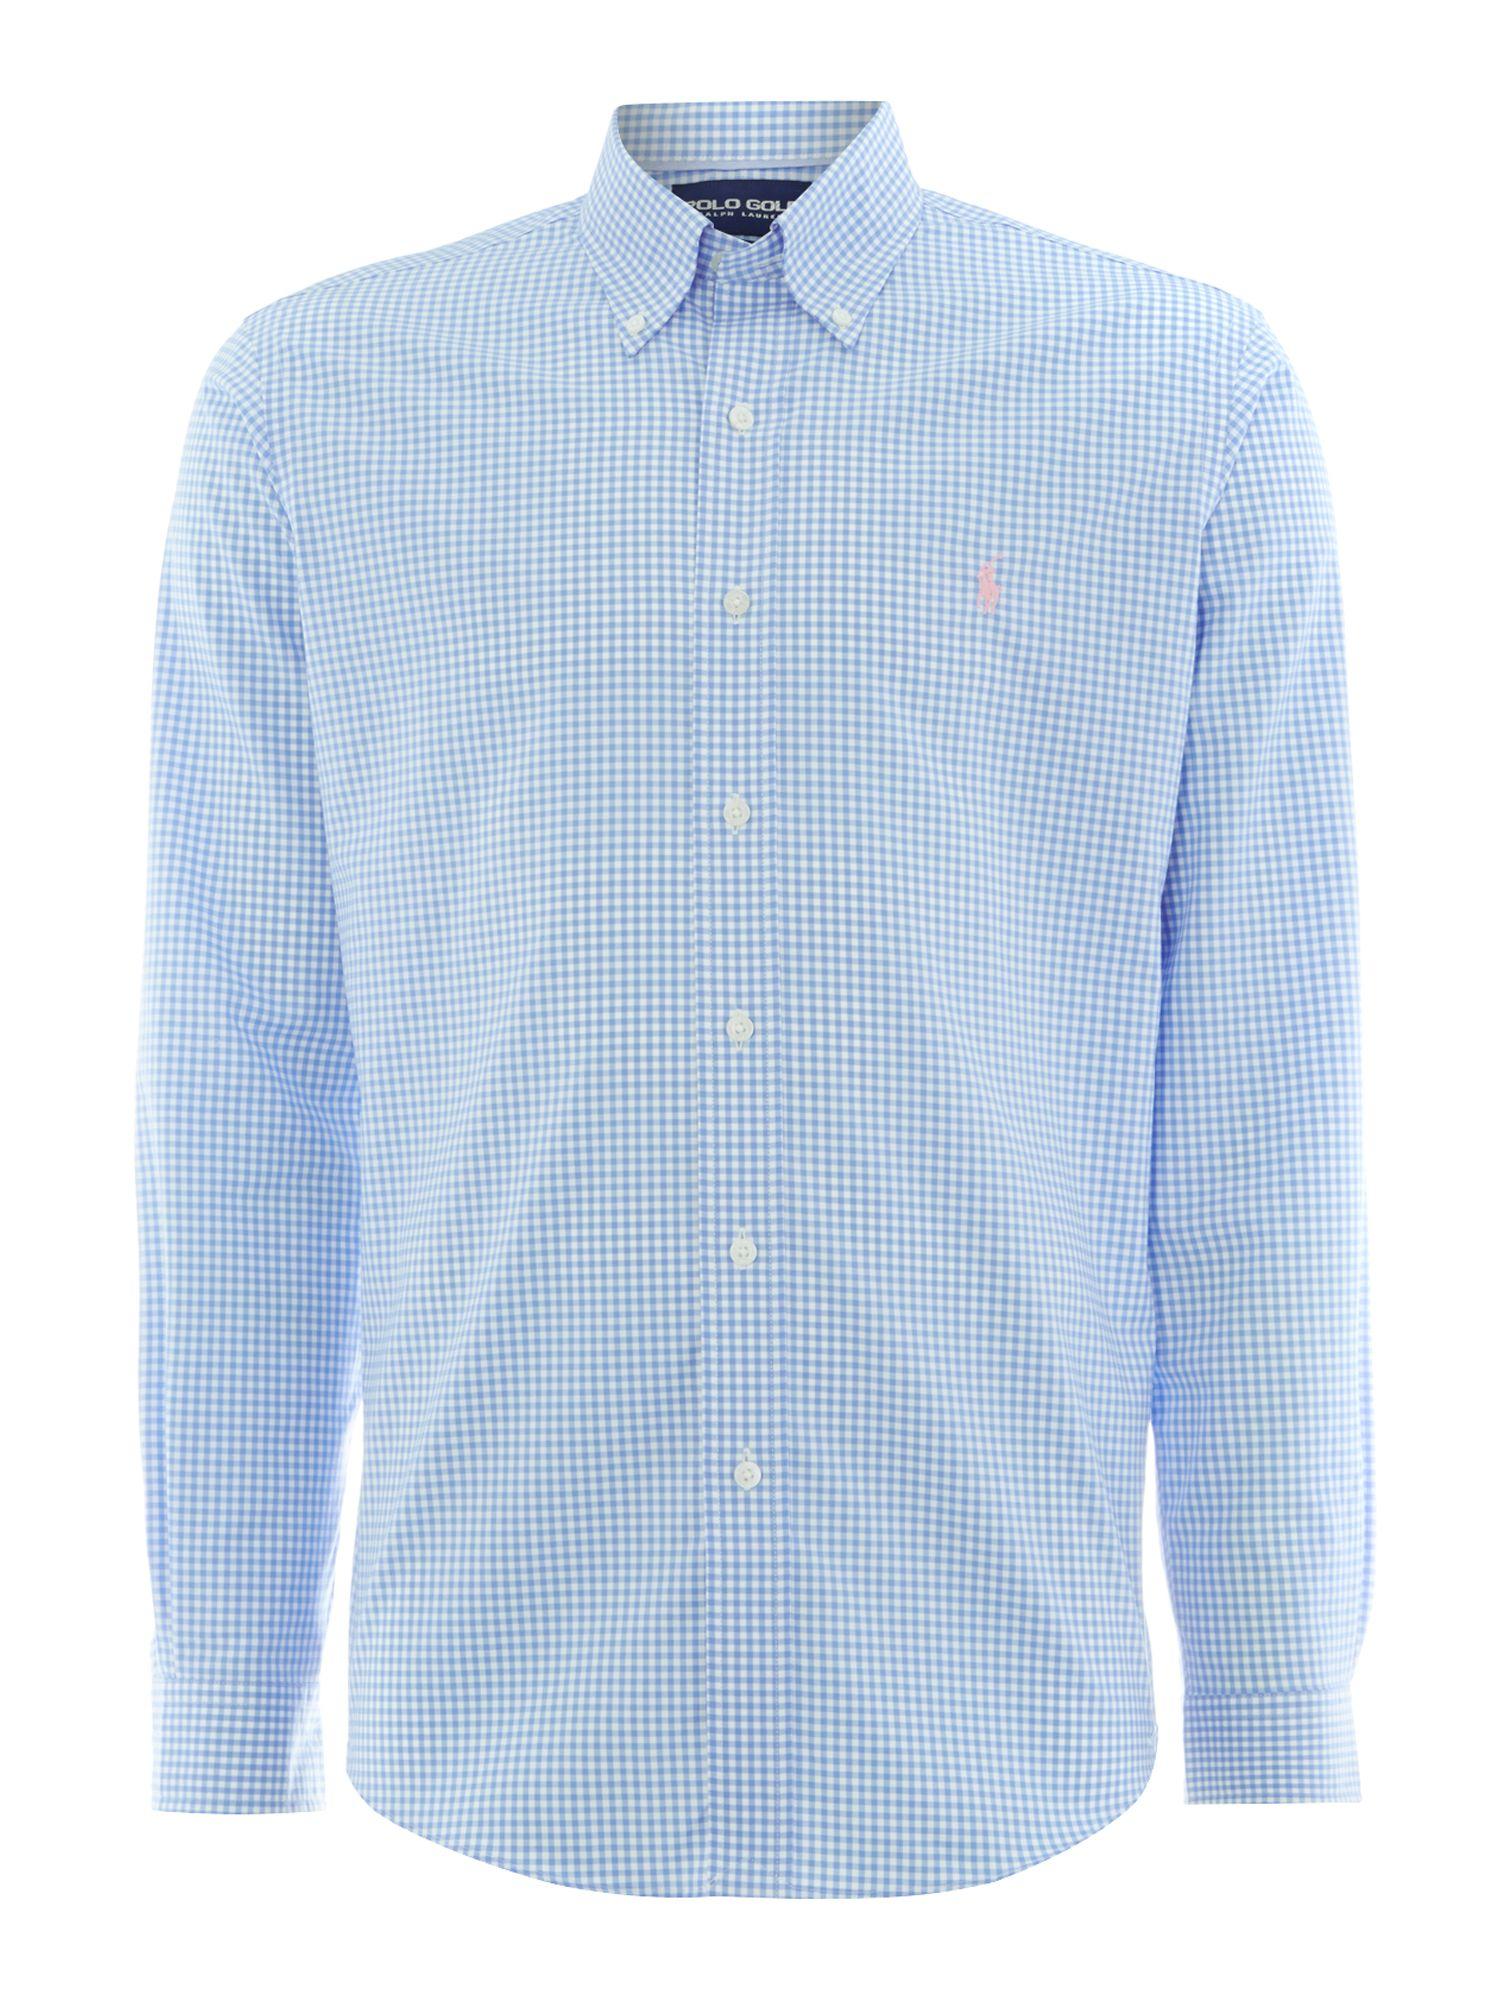 Lyst ralph lauren golf classic custom fit long sleeve for Custom fit dress shirts